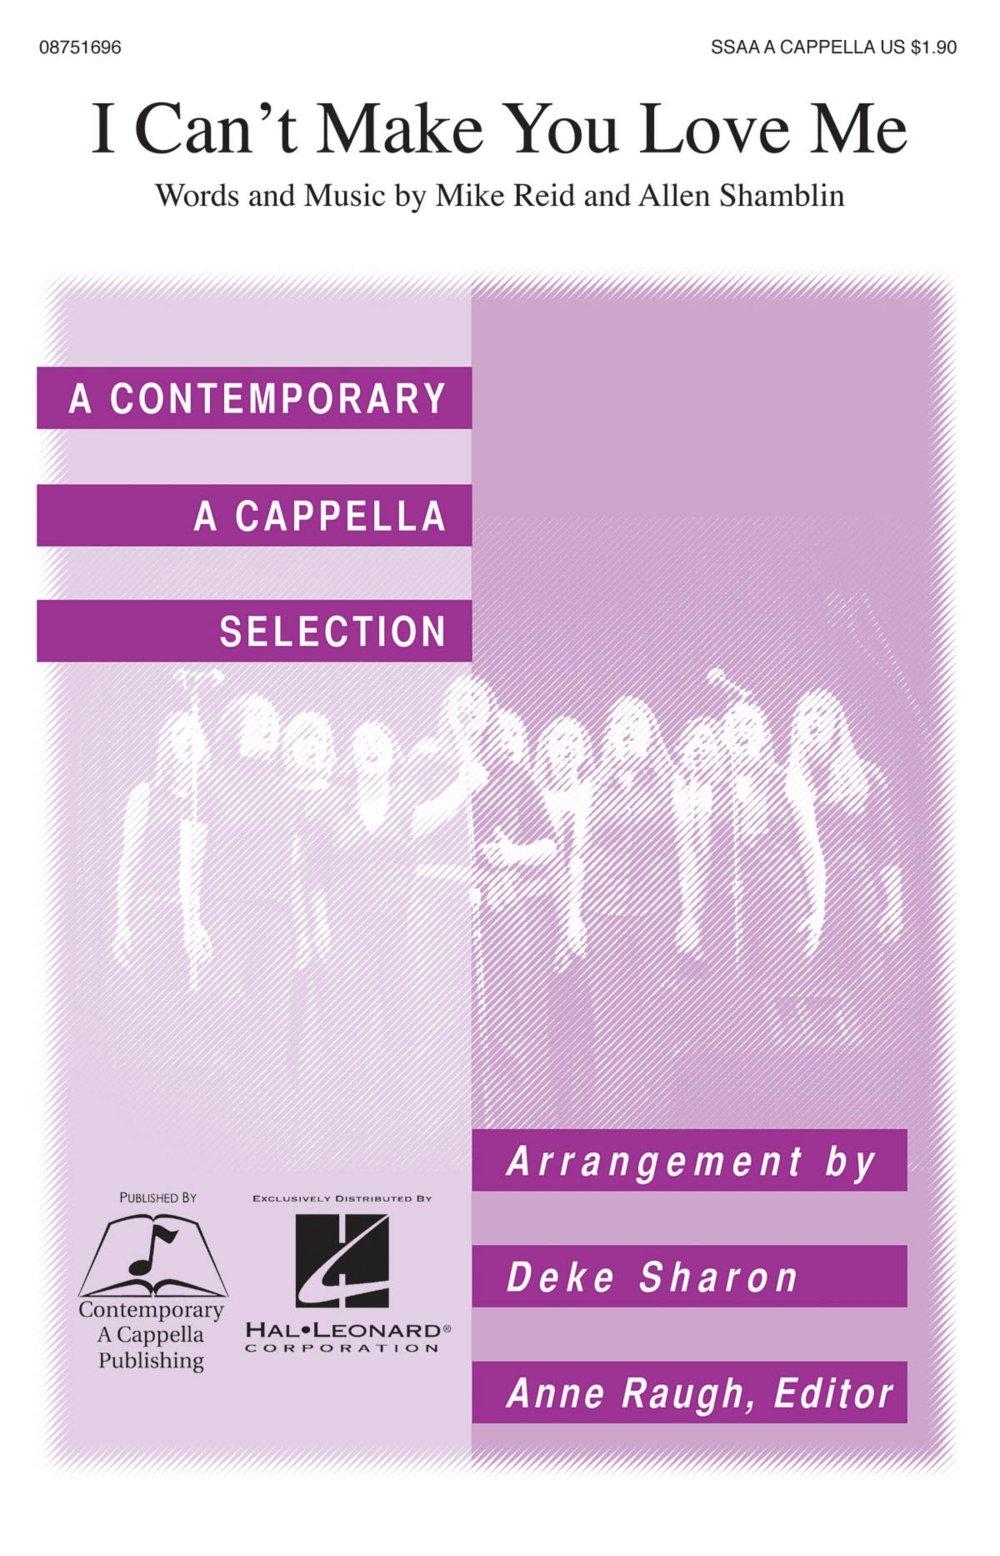 Download Contemporary A Cappella Publishing I Can't Make You Love Me SSAA A Cappella by Bonnie Raitt arranged by Deke Sharon pdf epub